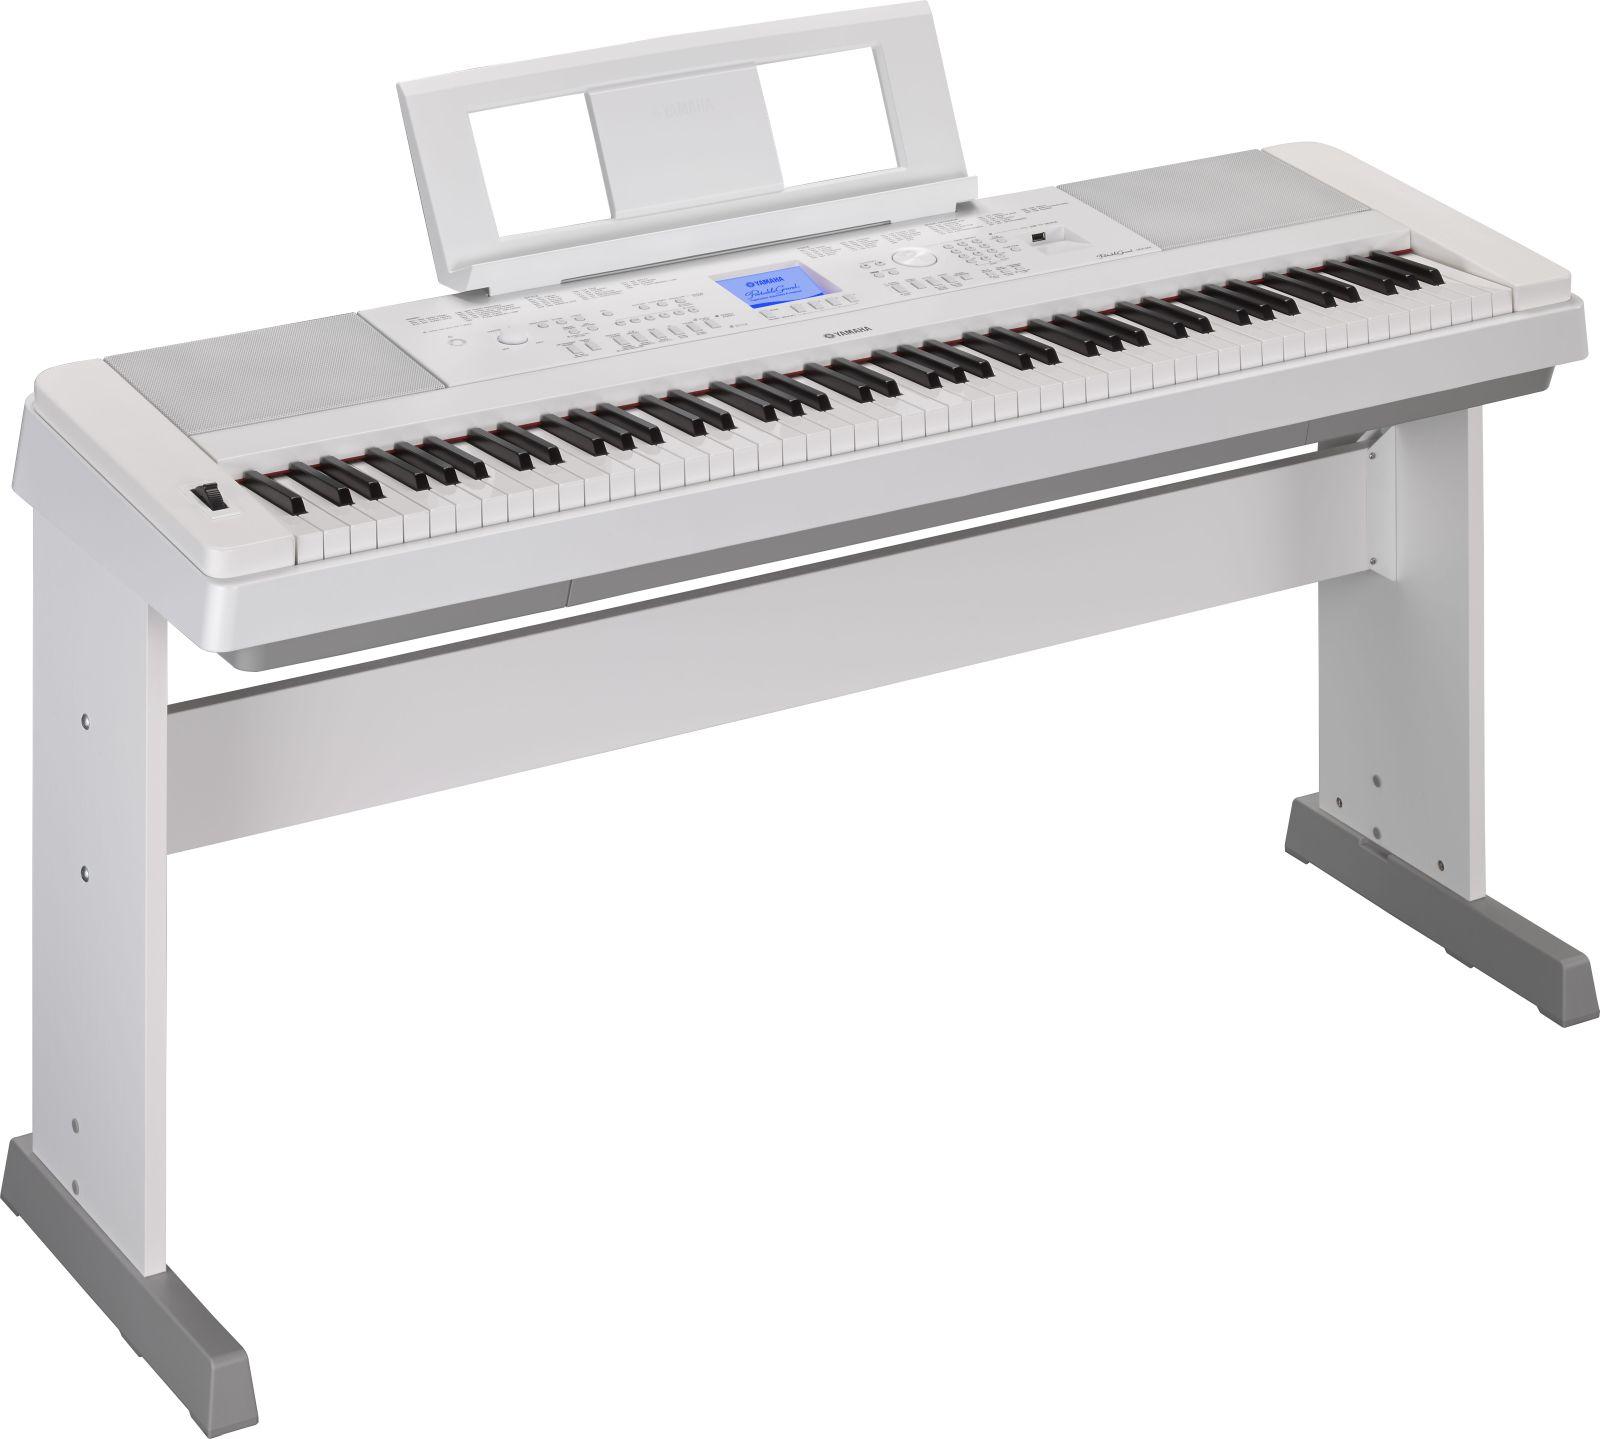 yamaha dgx660 blanc electronic keyboard buy online. Black Bedroom Furniture Sets. Home Design Ideas